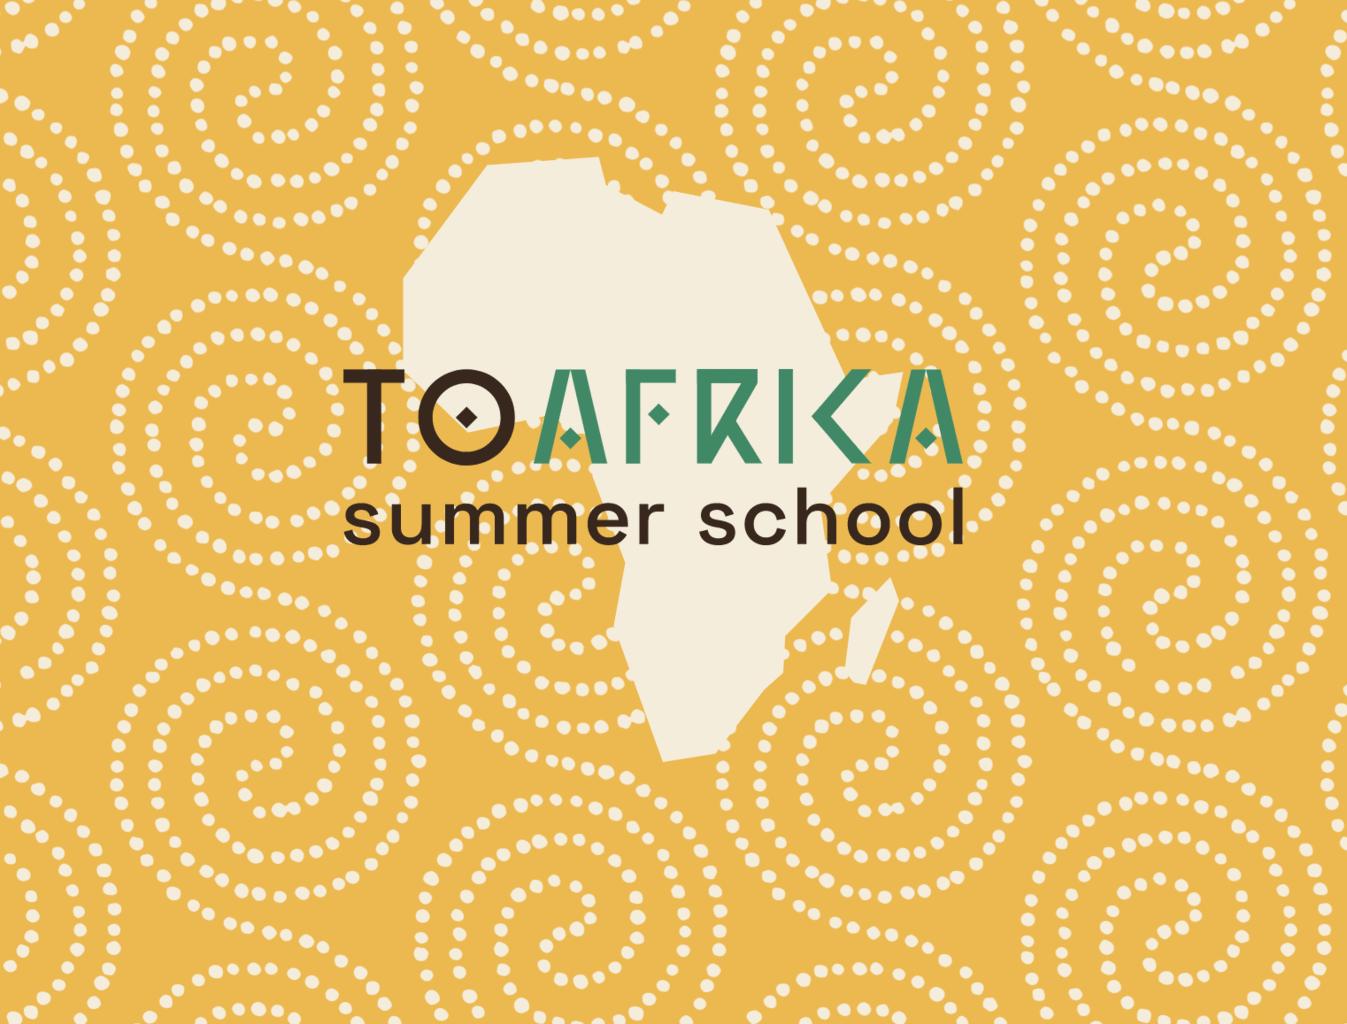 To Afrika summer school